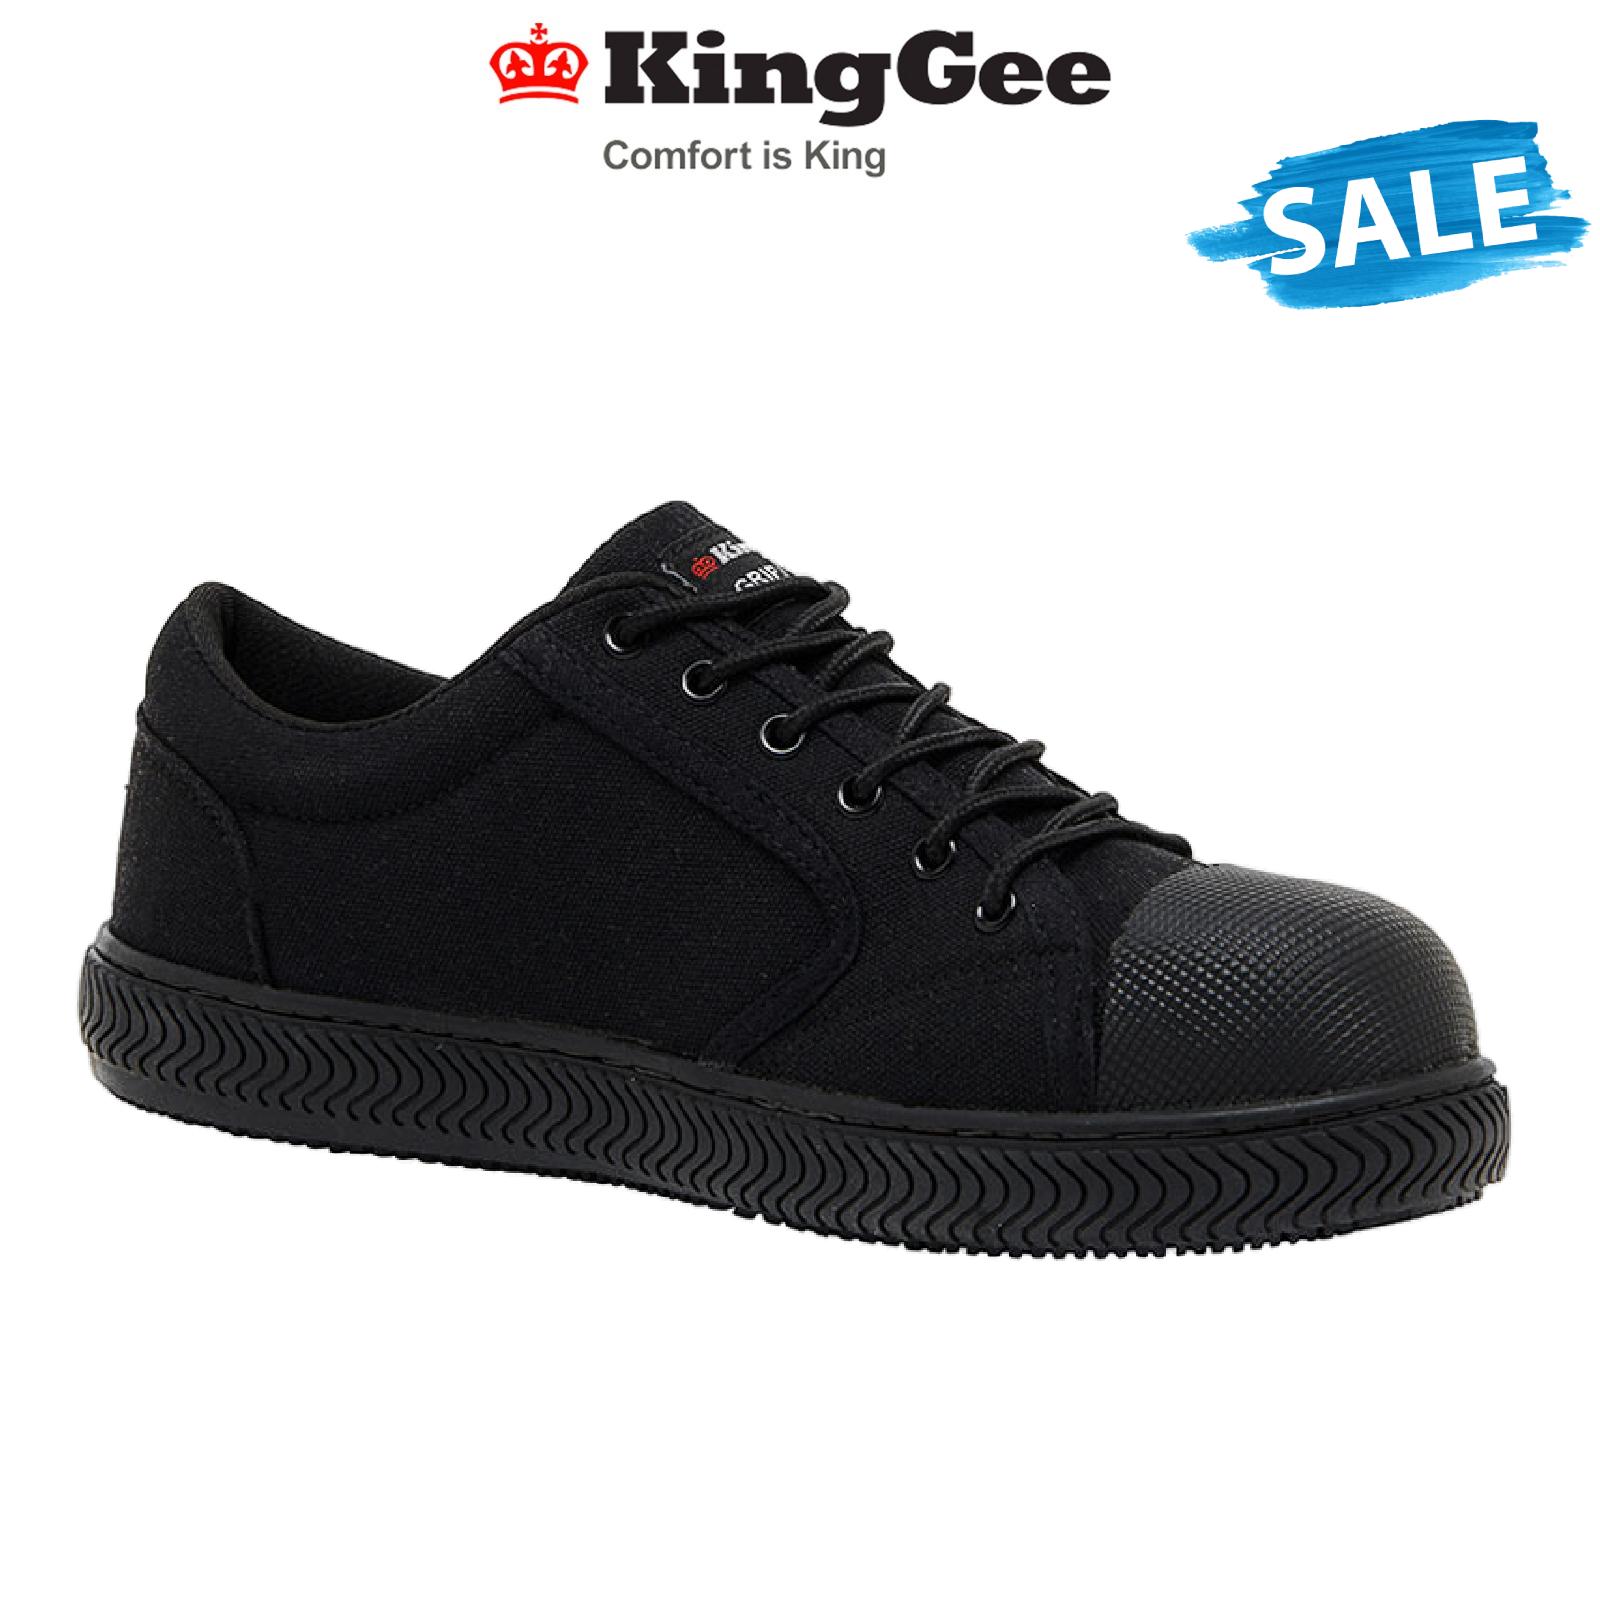 SALE KingGee Grip 3000 Canvas Shoes Rubber Toe Bump Comfortable Workwear K26540